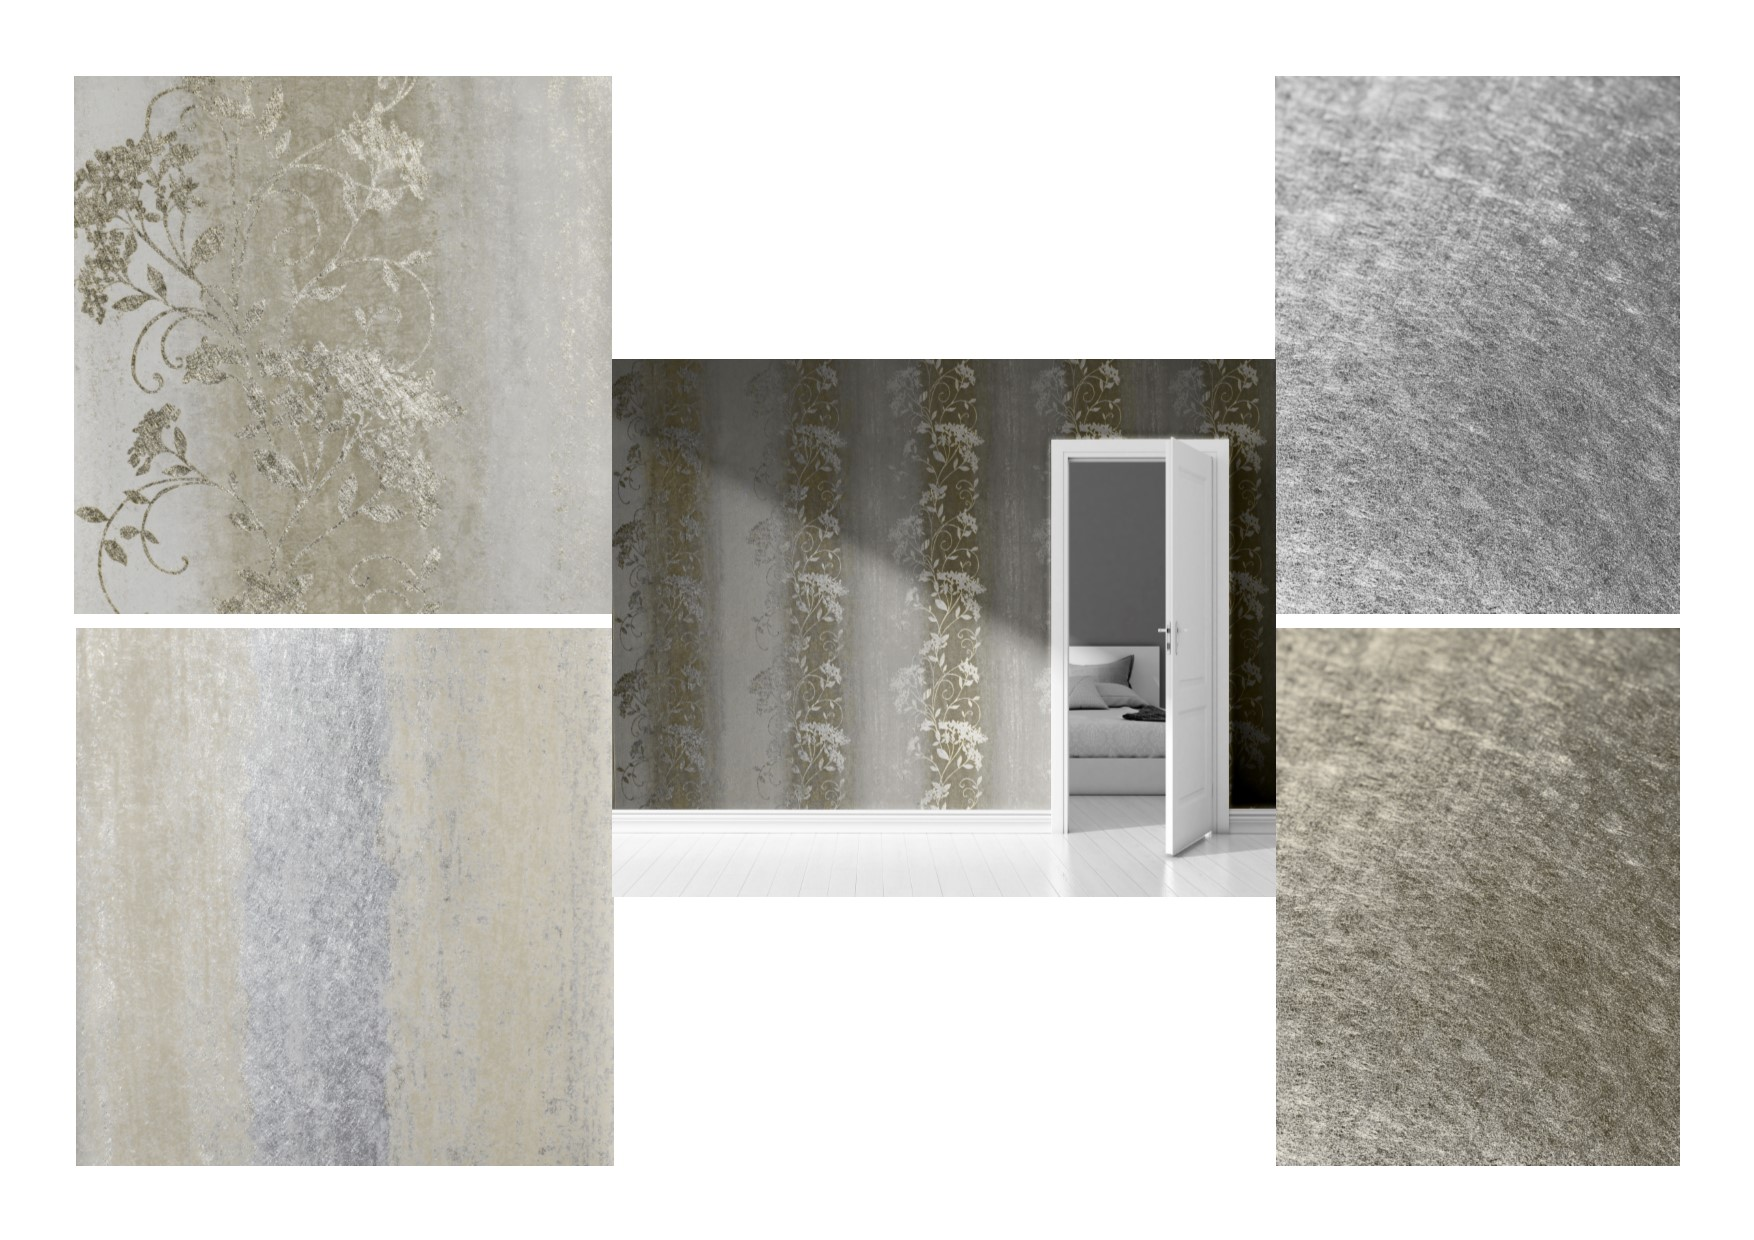 Muriva Sienna Ombre Metallic Silver Gold Foil Wallpaper 701581 701591 701600 701601